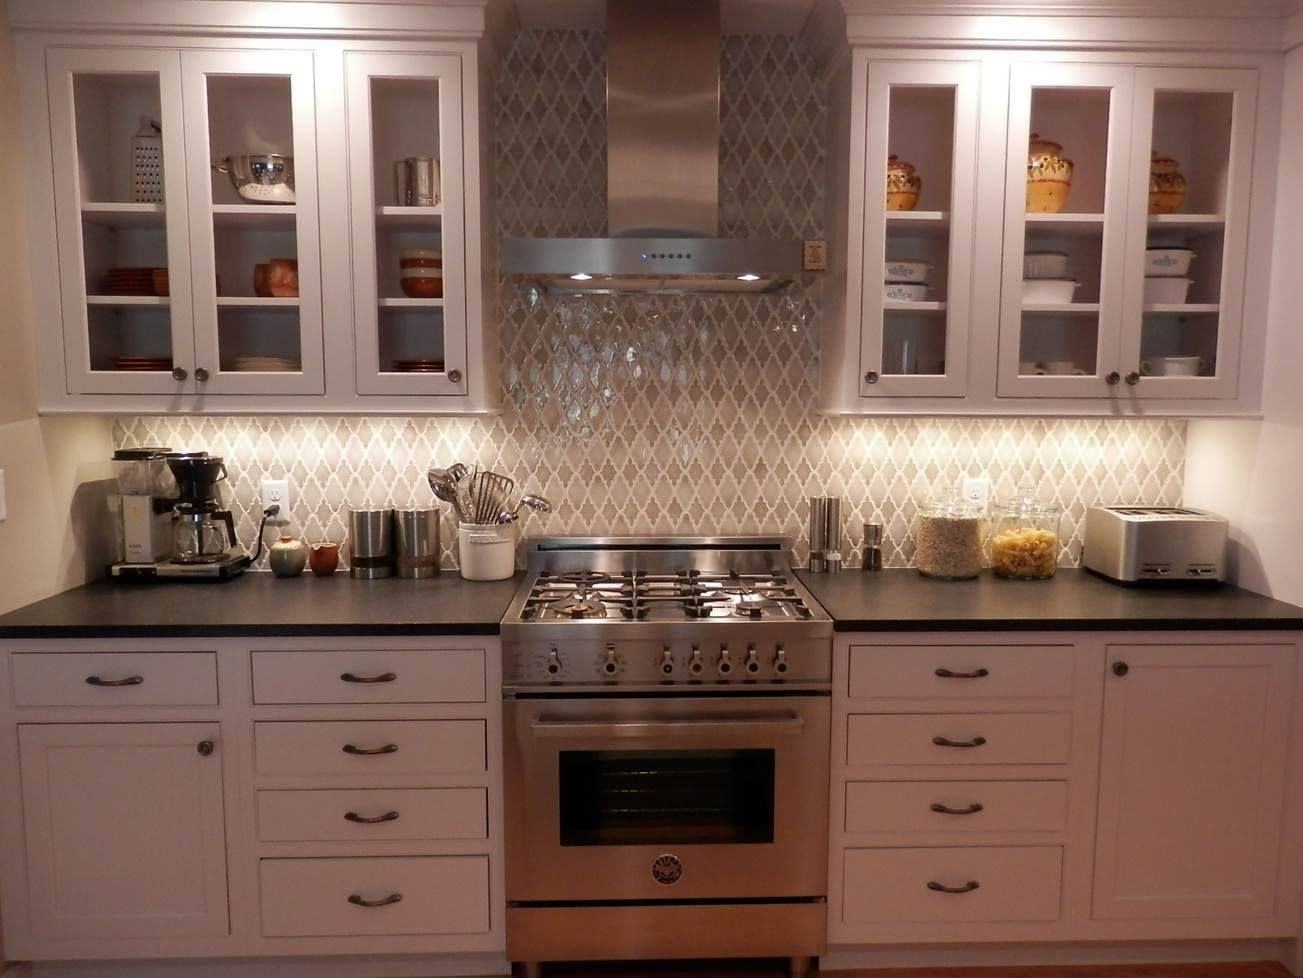 Encore Ceramics Arabesque Mosaic Kitchen Backsplash Hand Glazed In Silver Le And Shadow Quartz